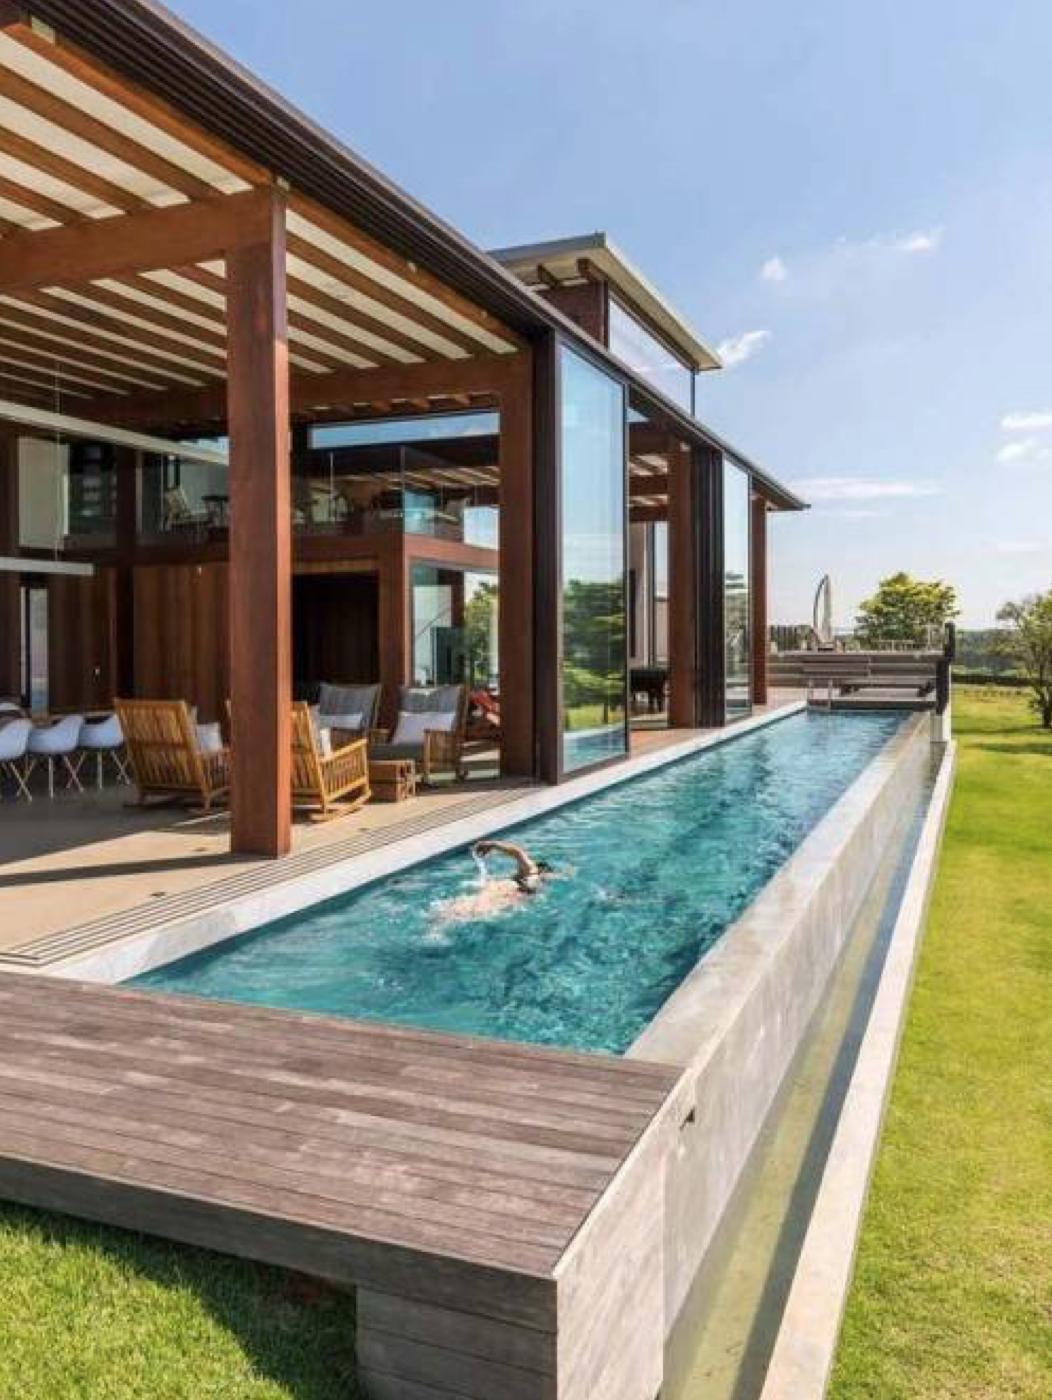 Pin By Dorothy Romisch On Houses Pool Houses Backyard Pool Backyard Pool Designs